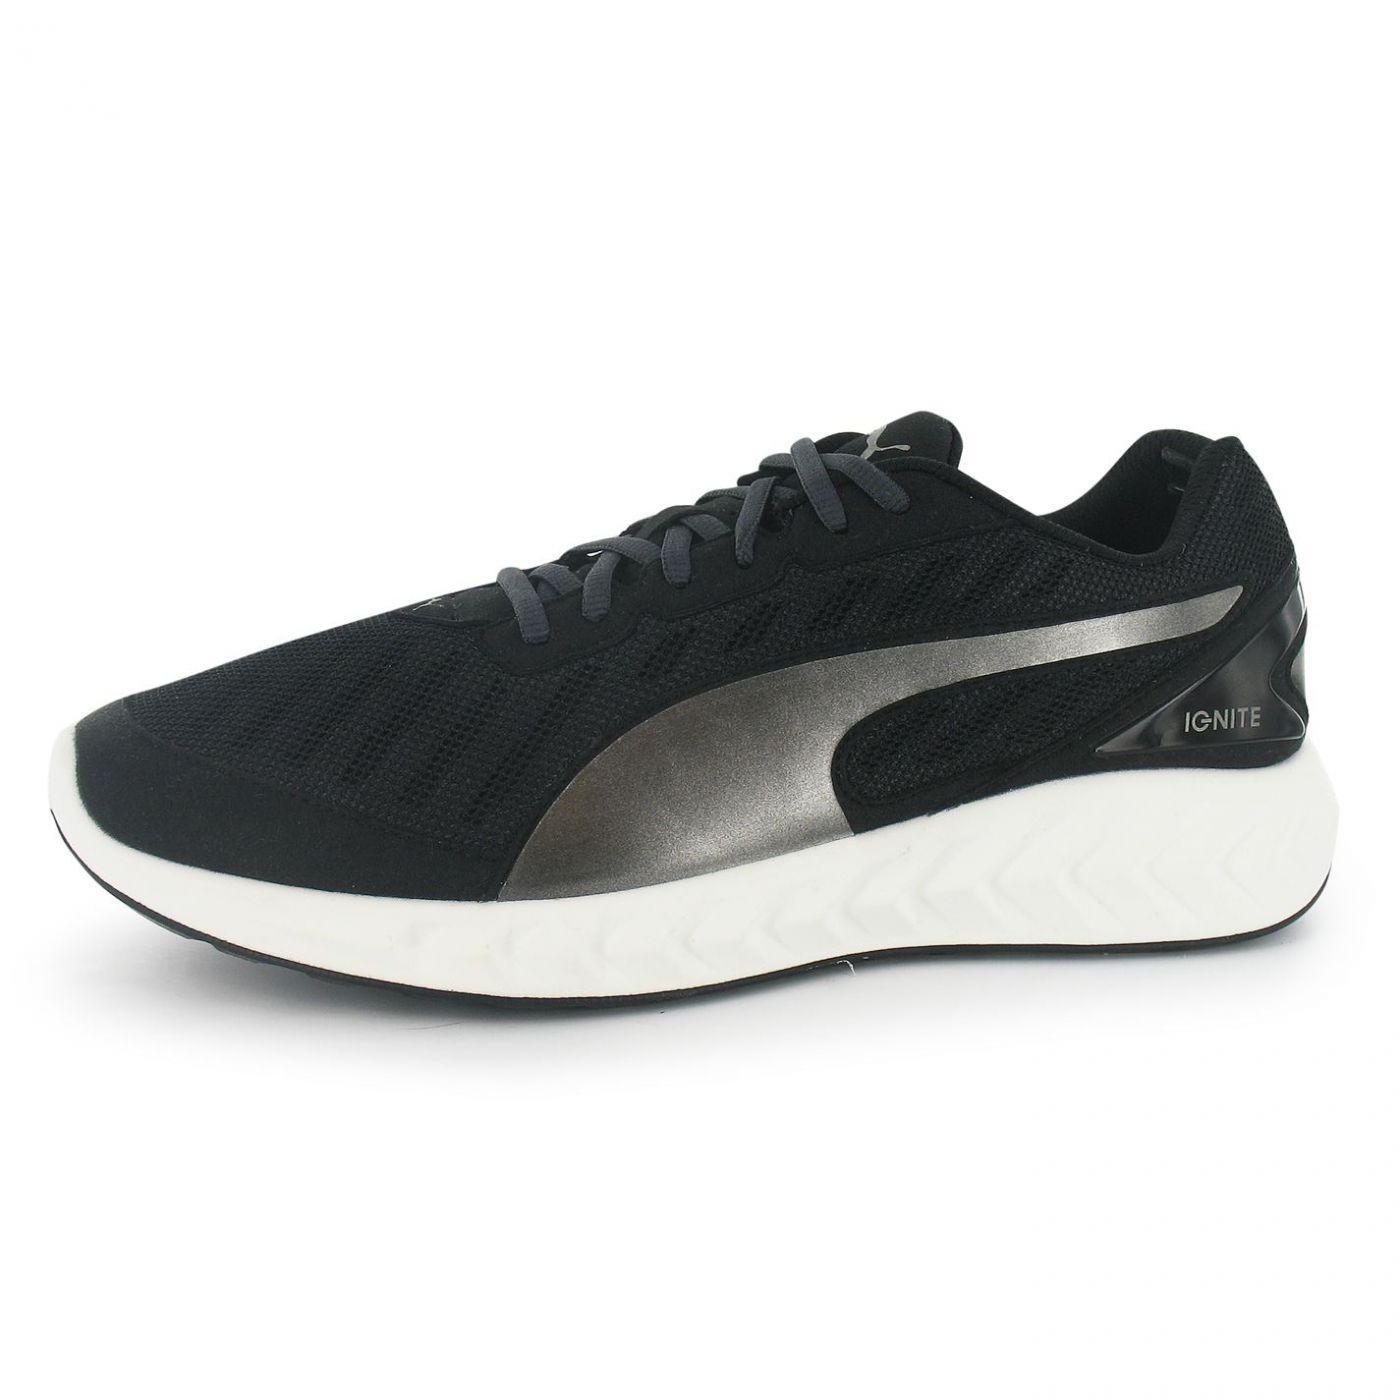 amistad Malgastar Esencialmente  Puma Ignite Ultimate Mens Running Shoes